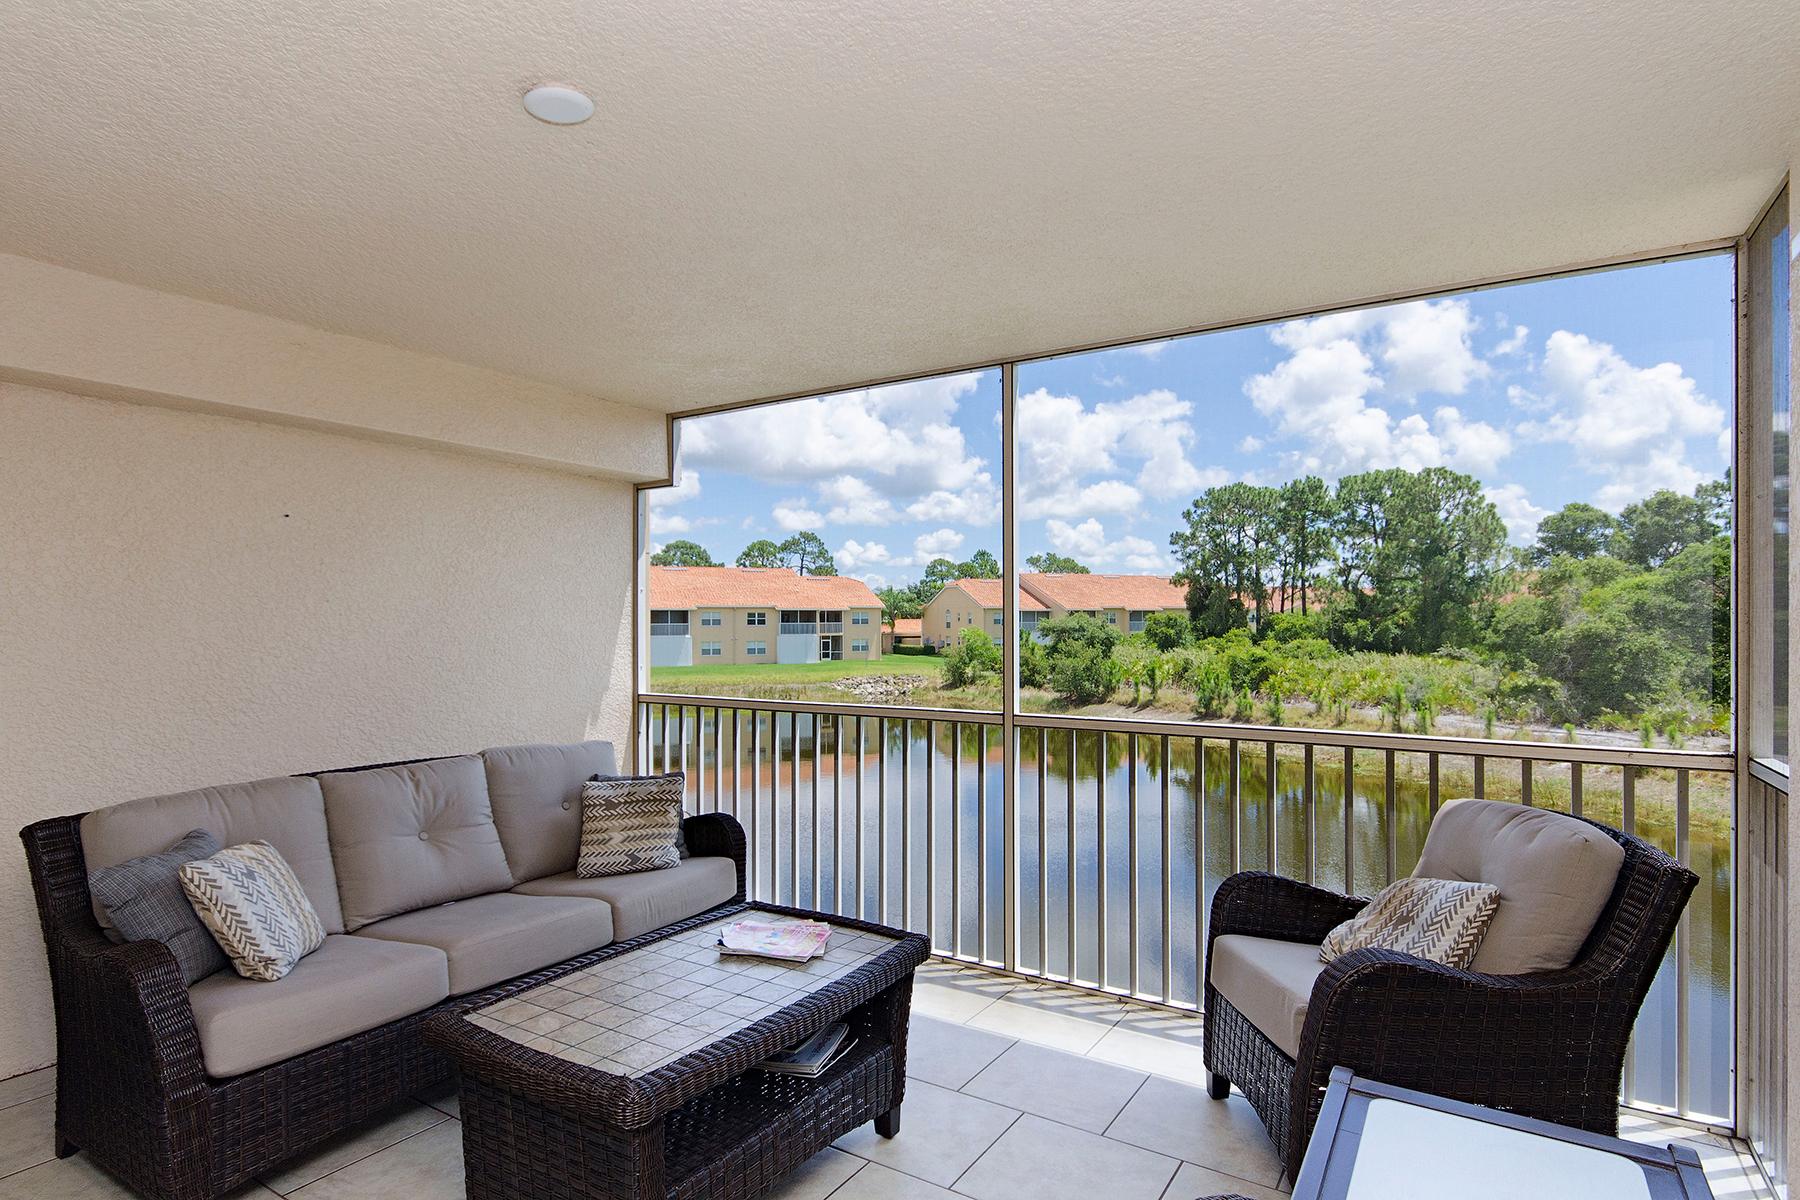 Condomínio para Venda às GARDENS AT BERMUDA LINKS 26630 Rosewood Pointe Dr 204 Bonita Springs, Florida, 34135 Estados Unidos